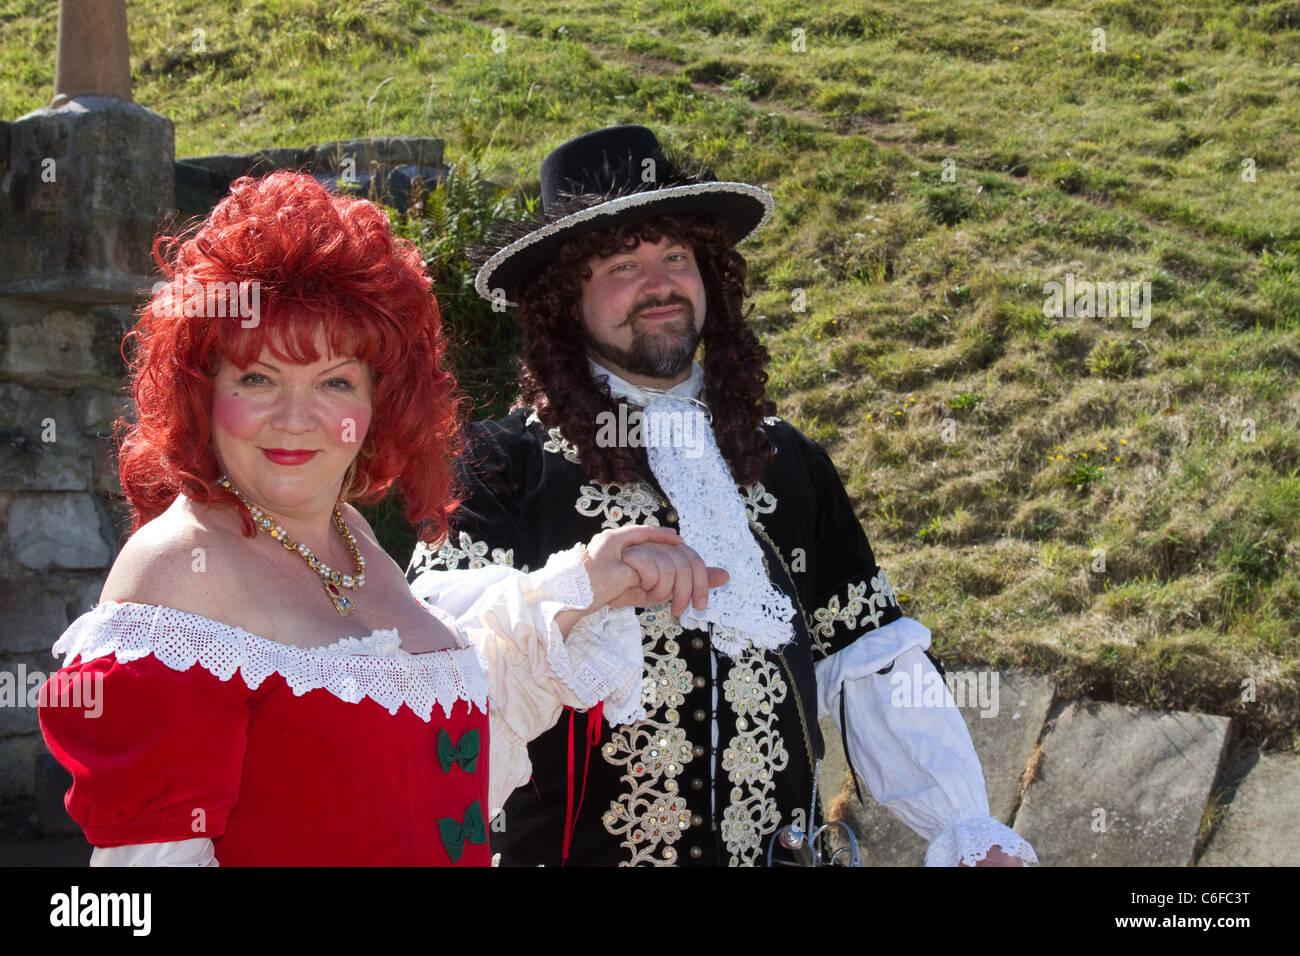 17th Century_Life & Times_Military and Civilian Historical Re-enactment, Tutbury Castle, Derbyshire, UK - Stock Image